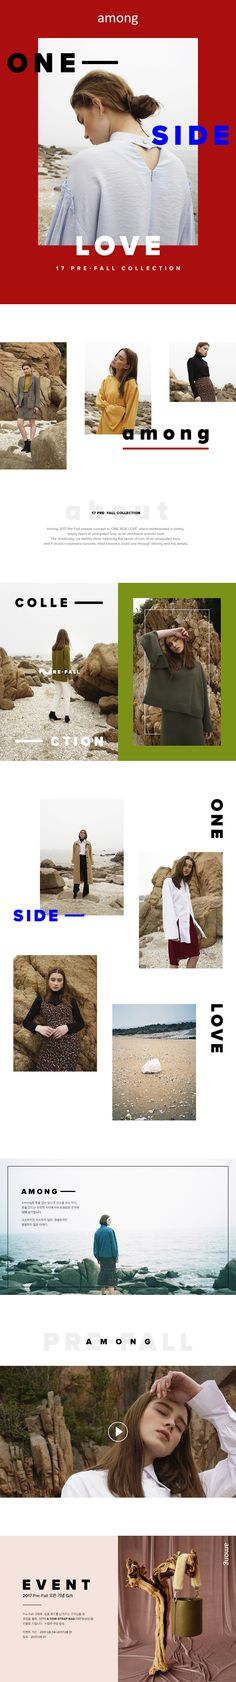 W Concept Official Site, Unique Designer Brand Editing Shop - # Web Design, The Design Files, Email Design, Page Design, Book Design, Editorial Layout, Editorial Design, Layout Inspiration, Graphic Design Inspiration